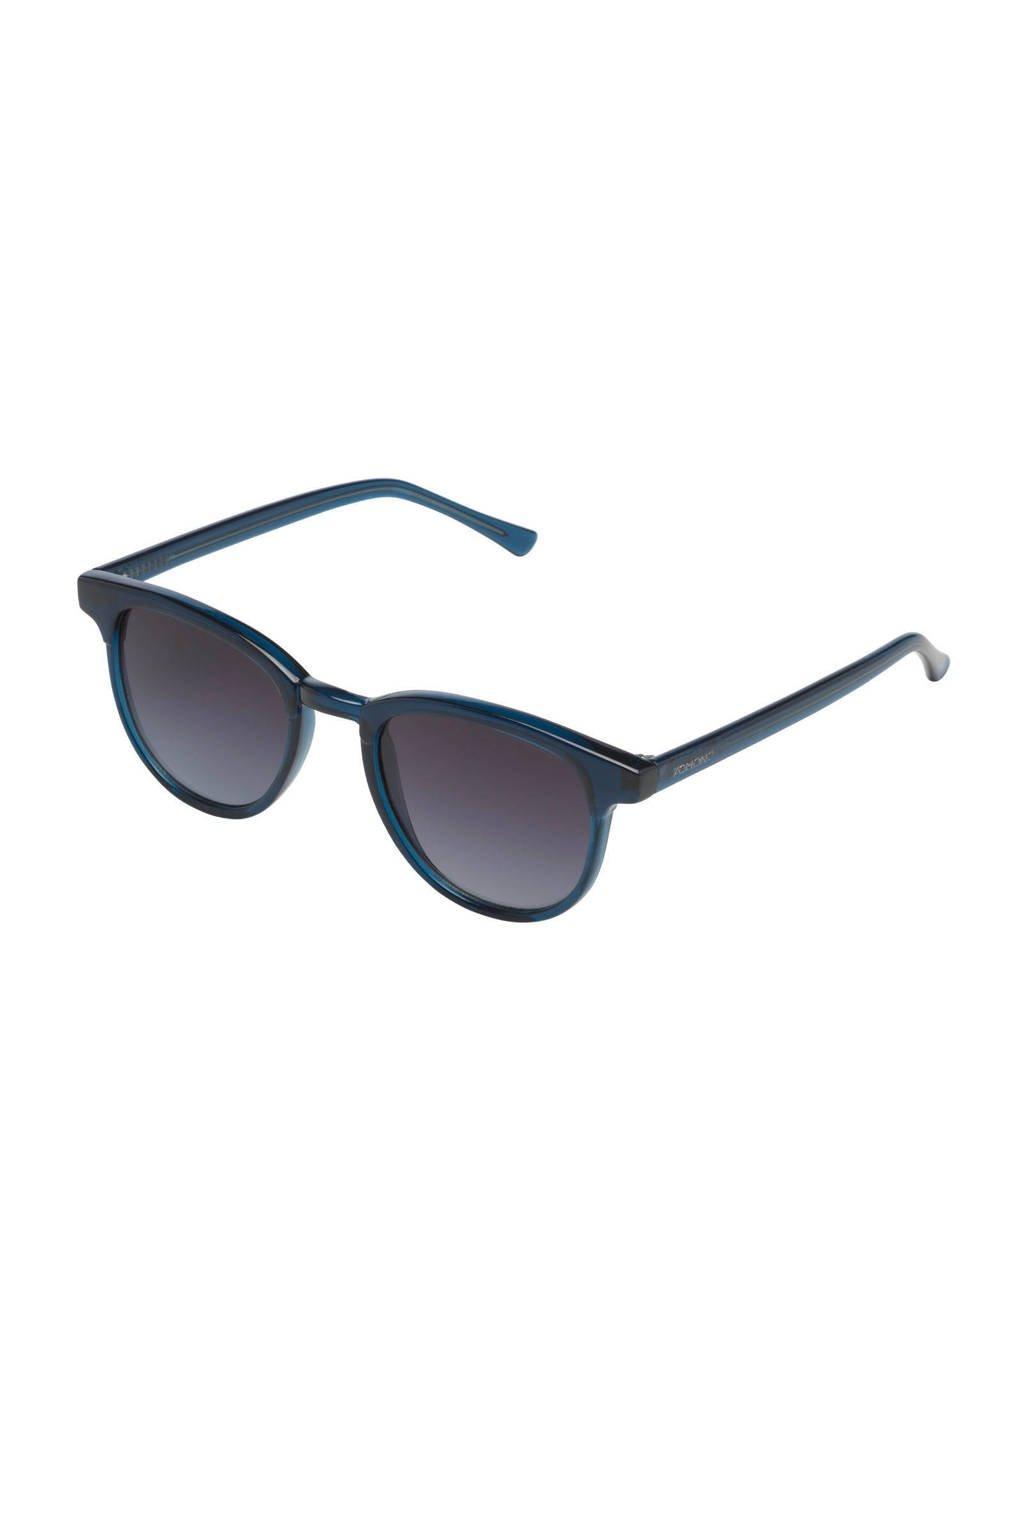 Komono zonnebril Francis donkerblauw